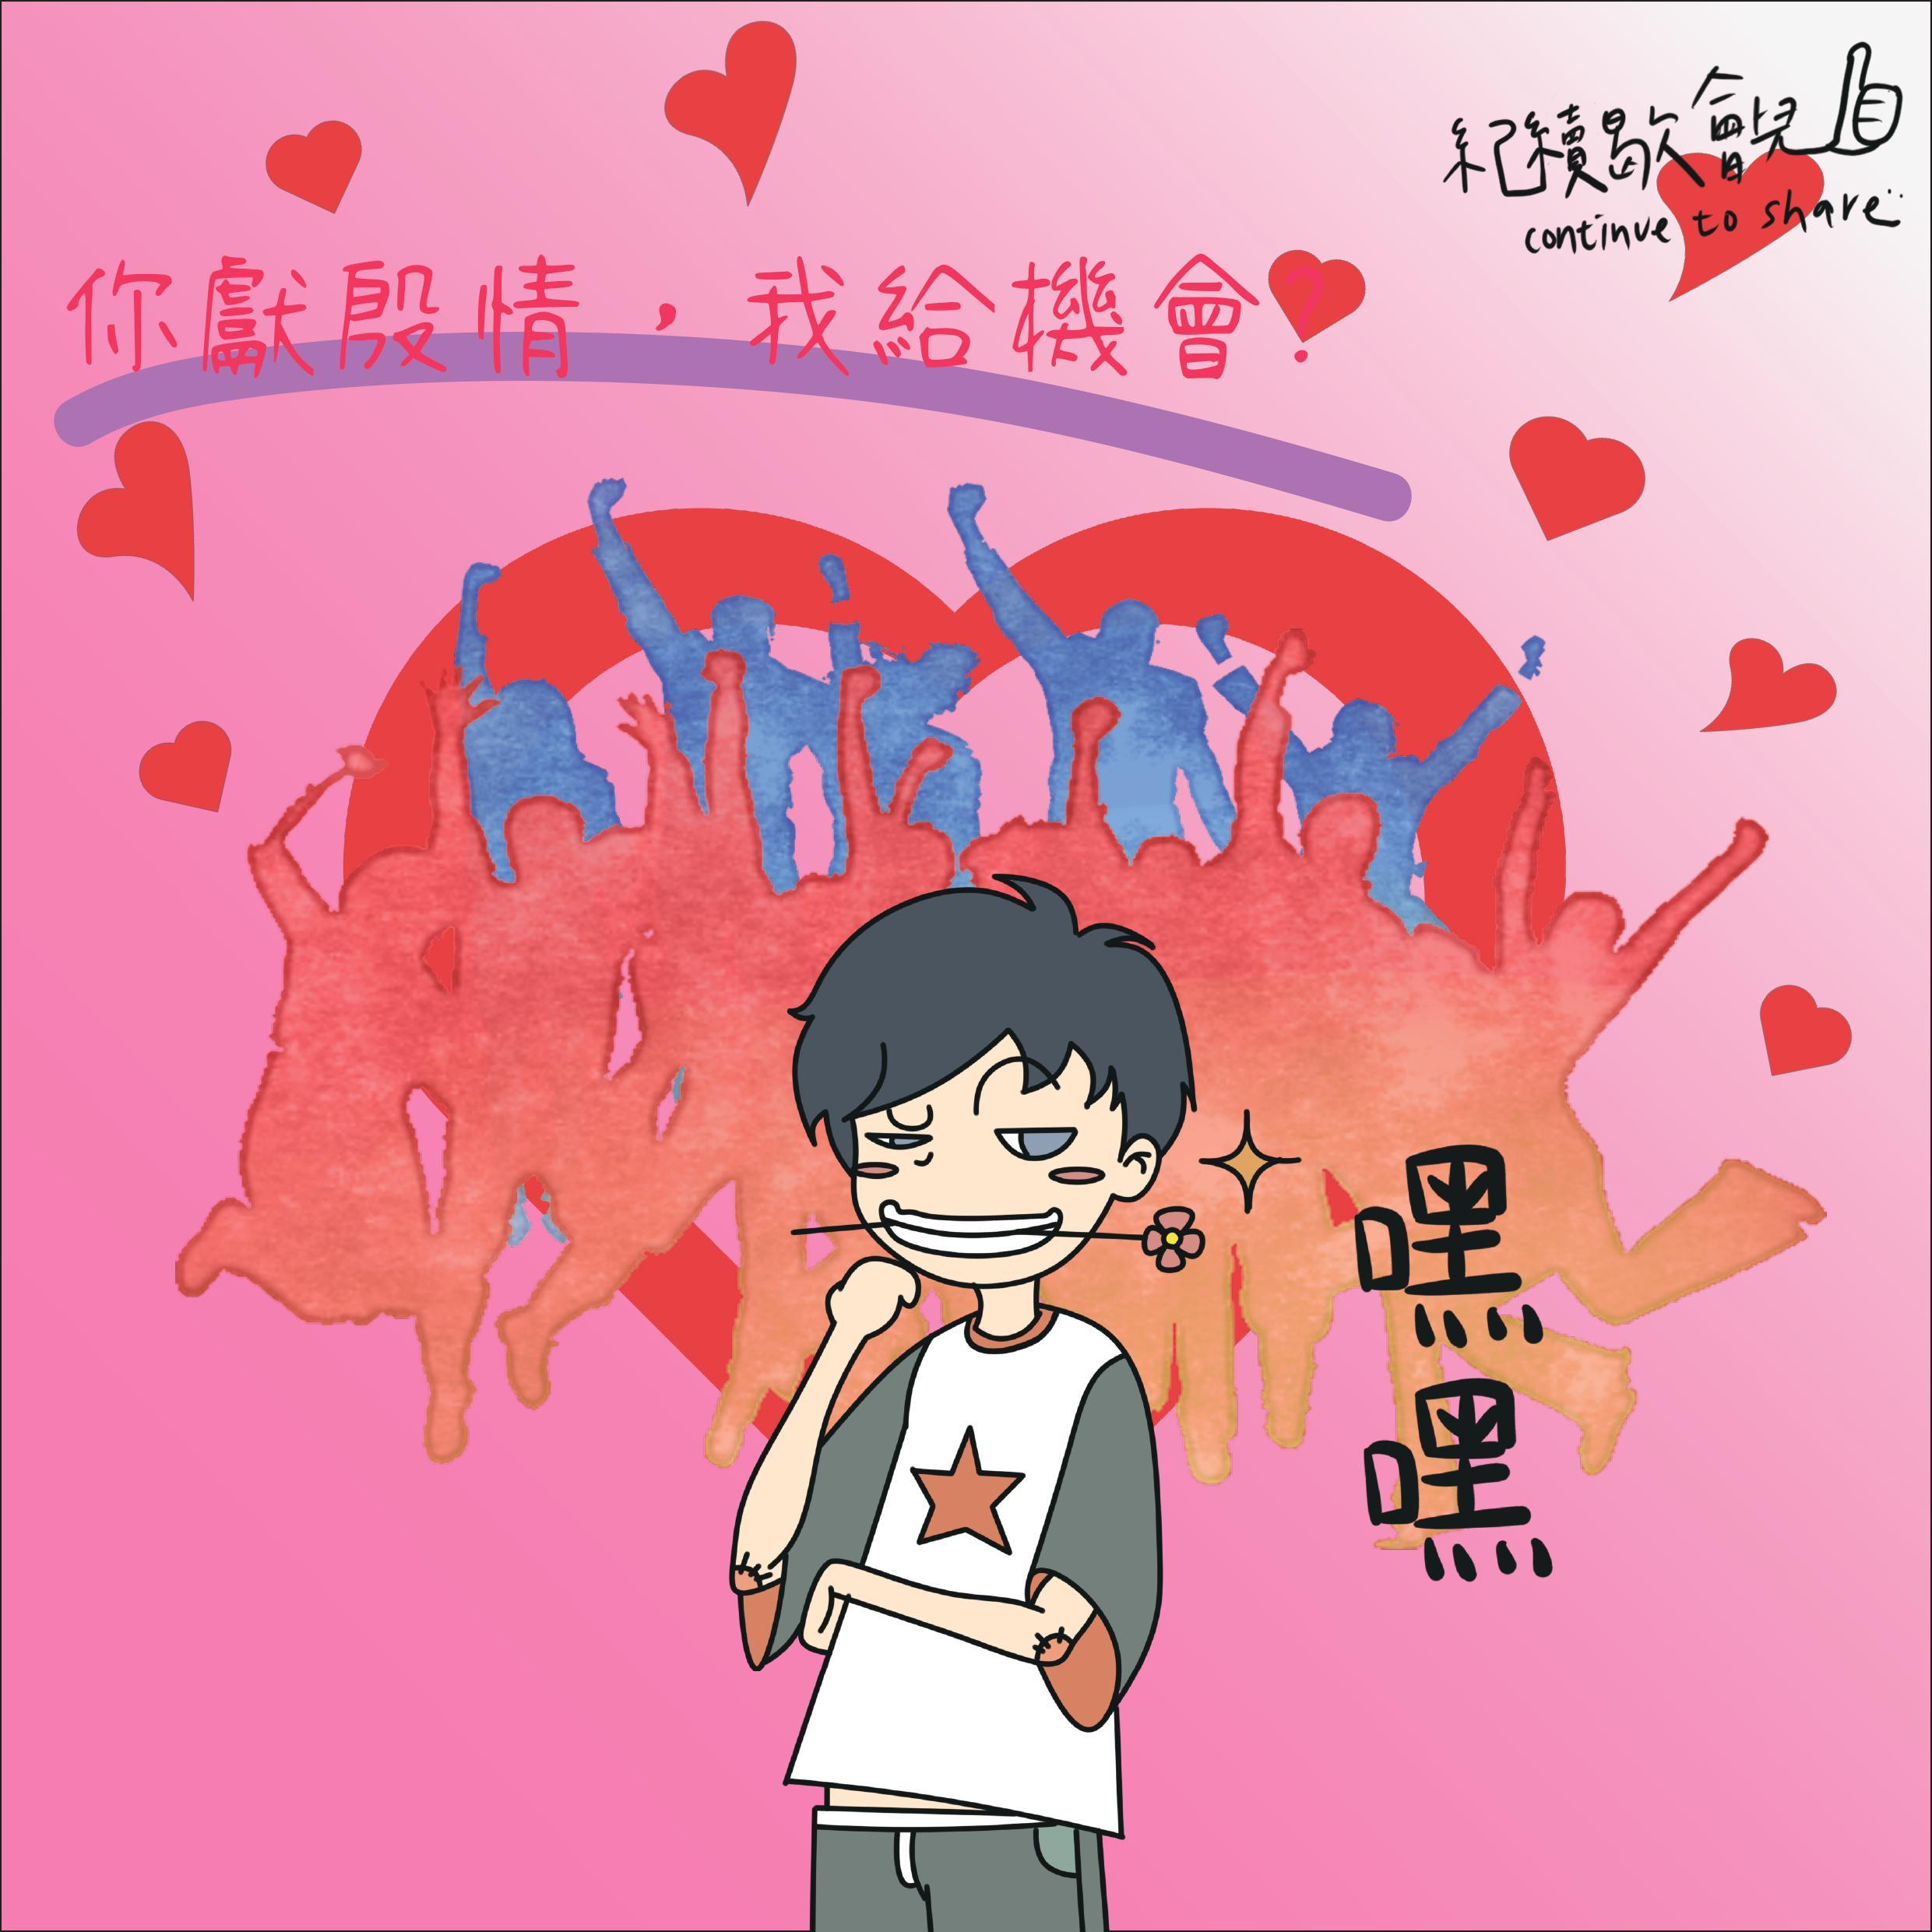 EP.6你獻殷勤,我給機會-feat. Nisson aka 林口沈玉琳